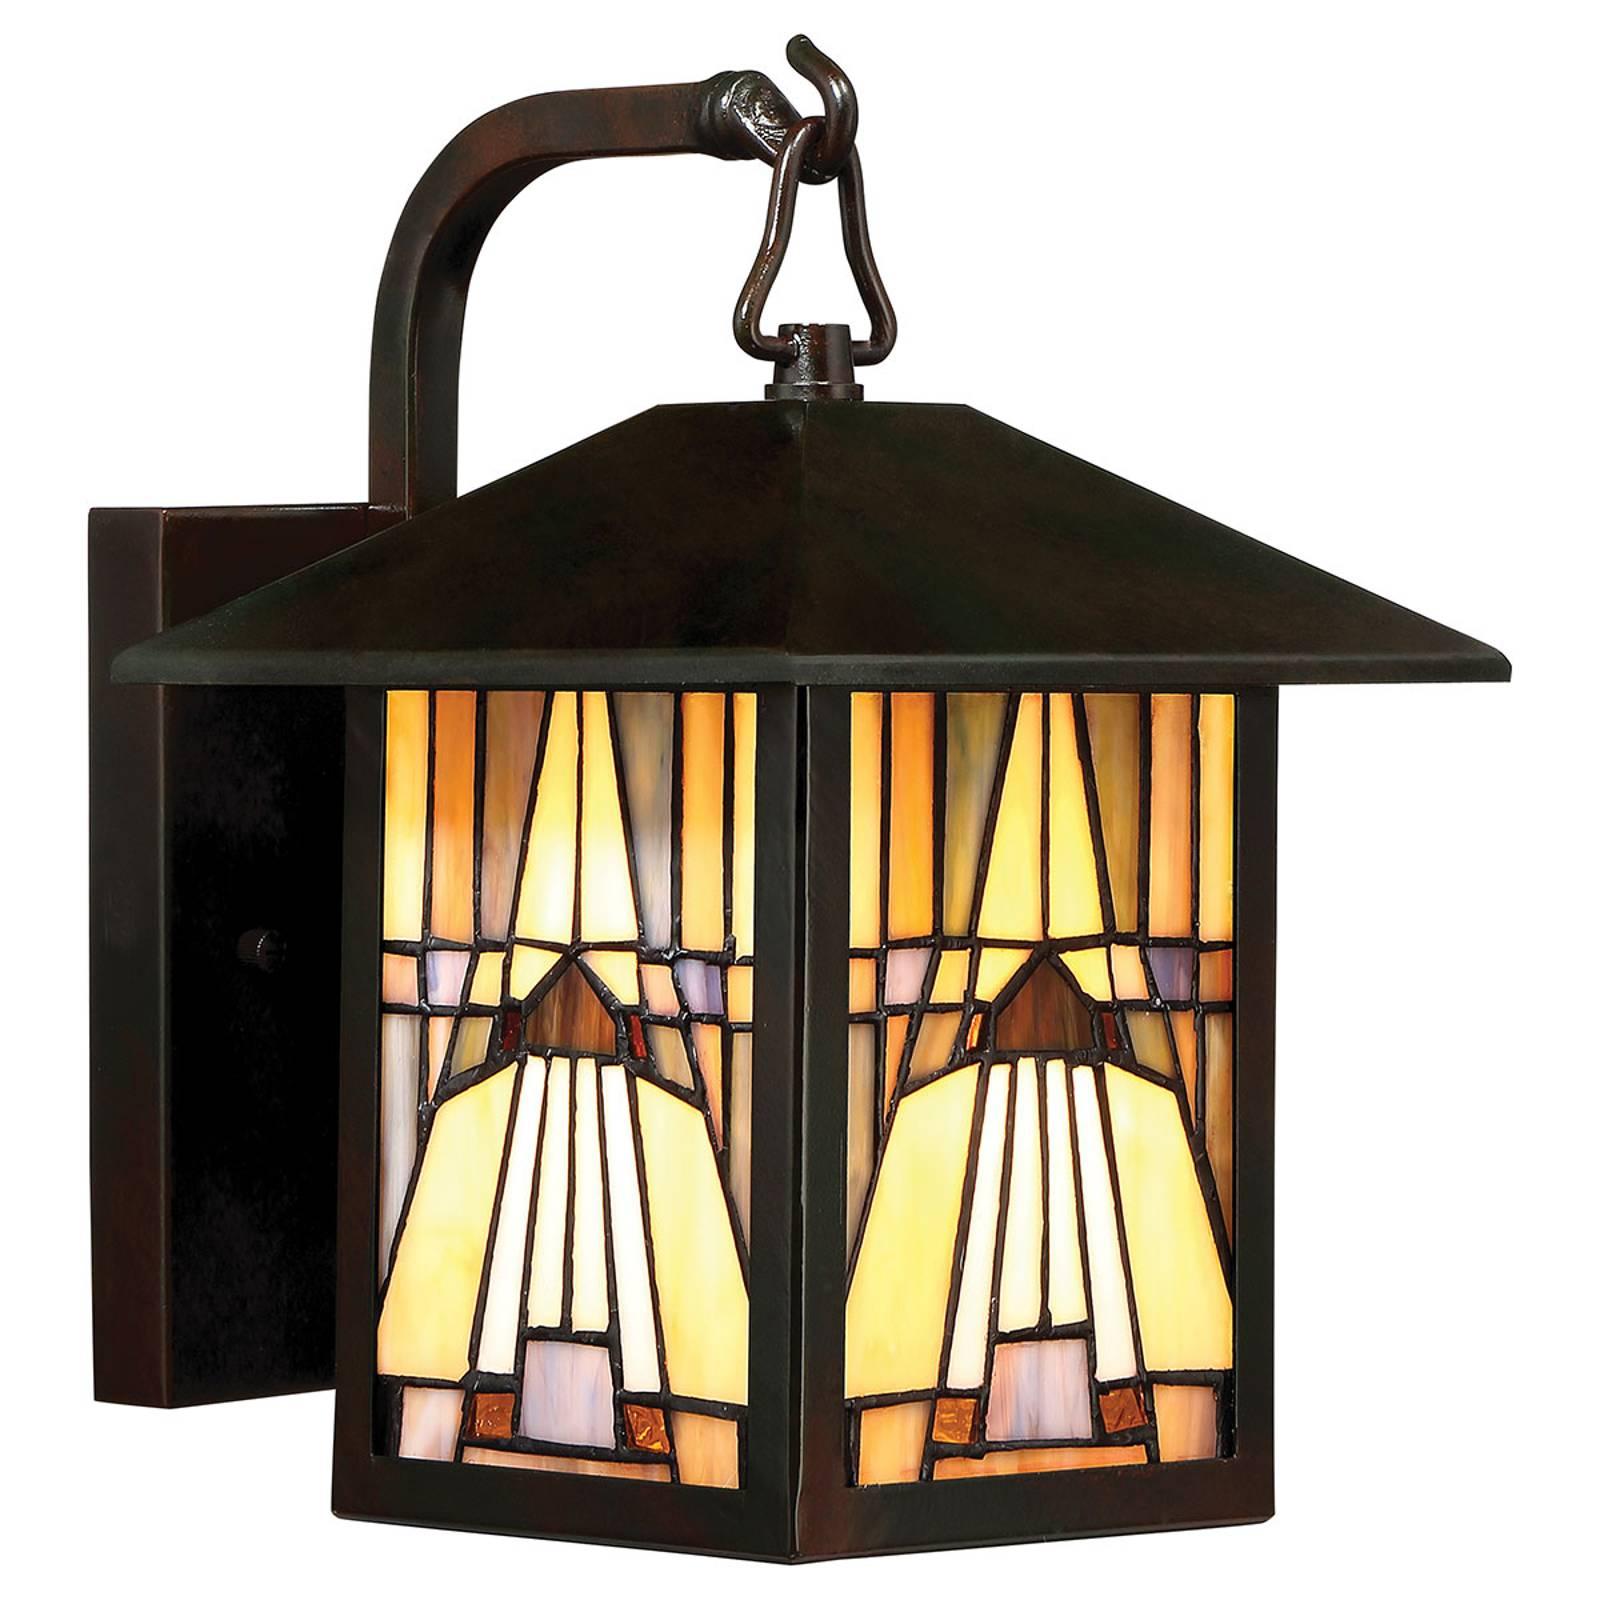 Buitenwandlamp Inglenook, bont glas, H 27,8 cm